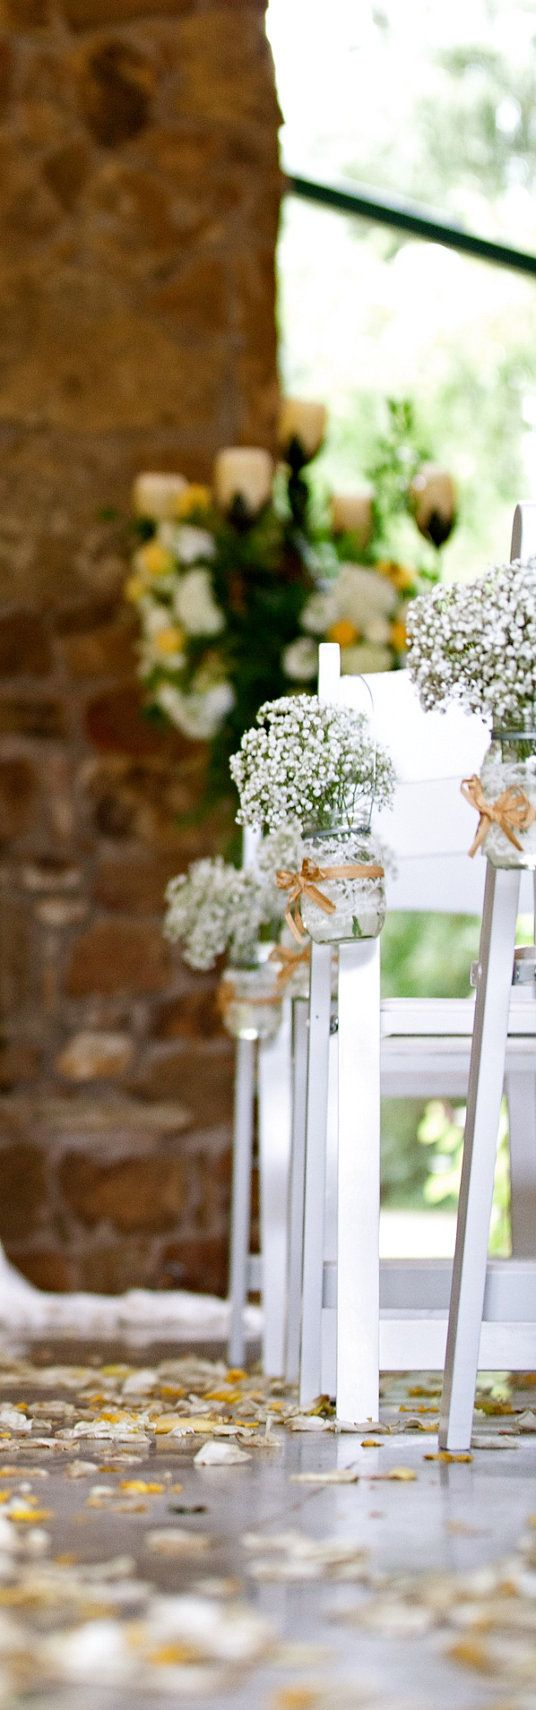 Vintage Mason Jar Vases for Wedding Ceremony Aisle, Vintage Rustic Wedding Decor